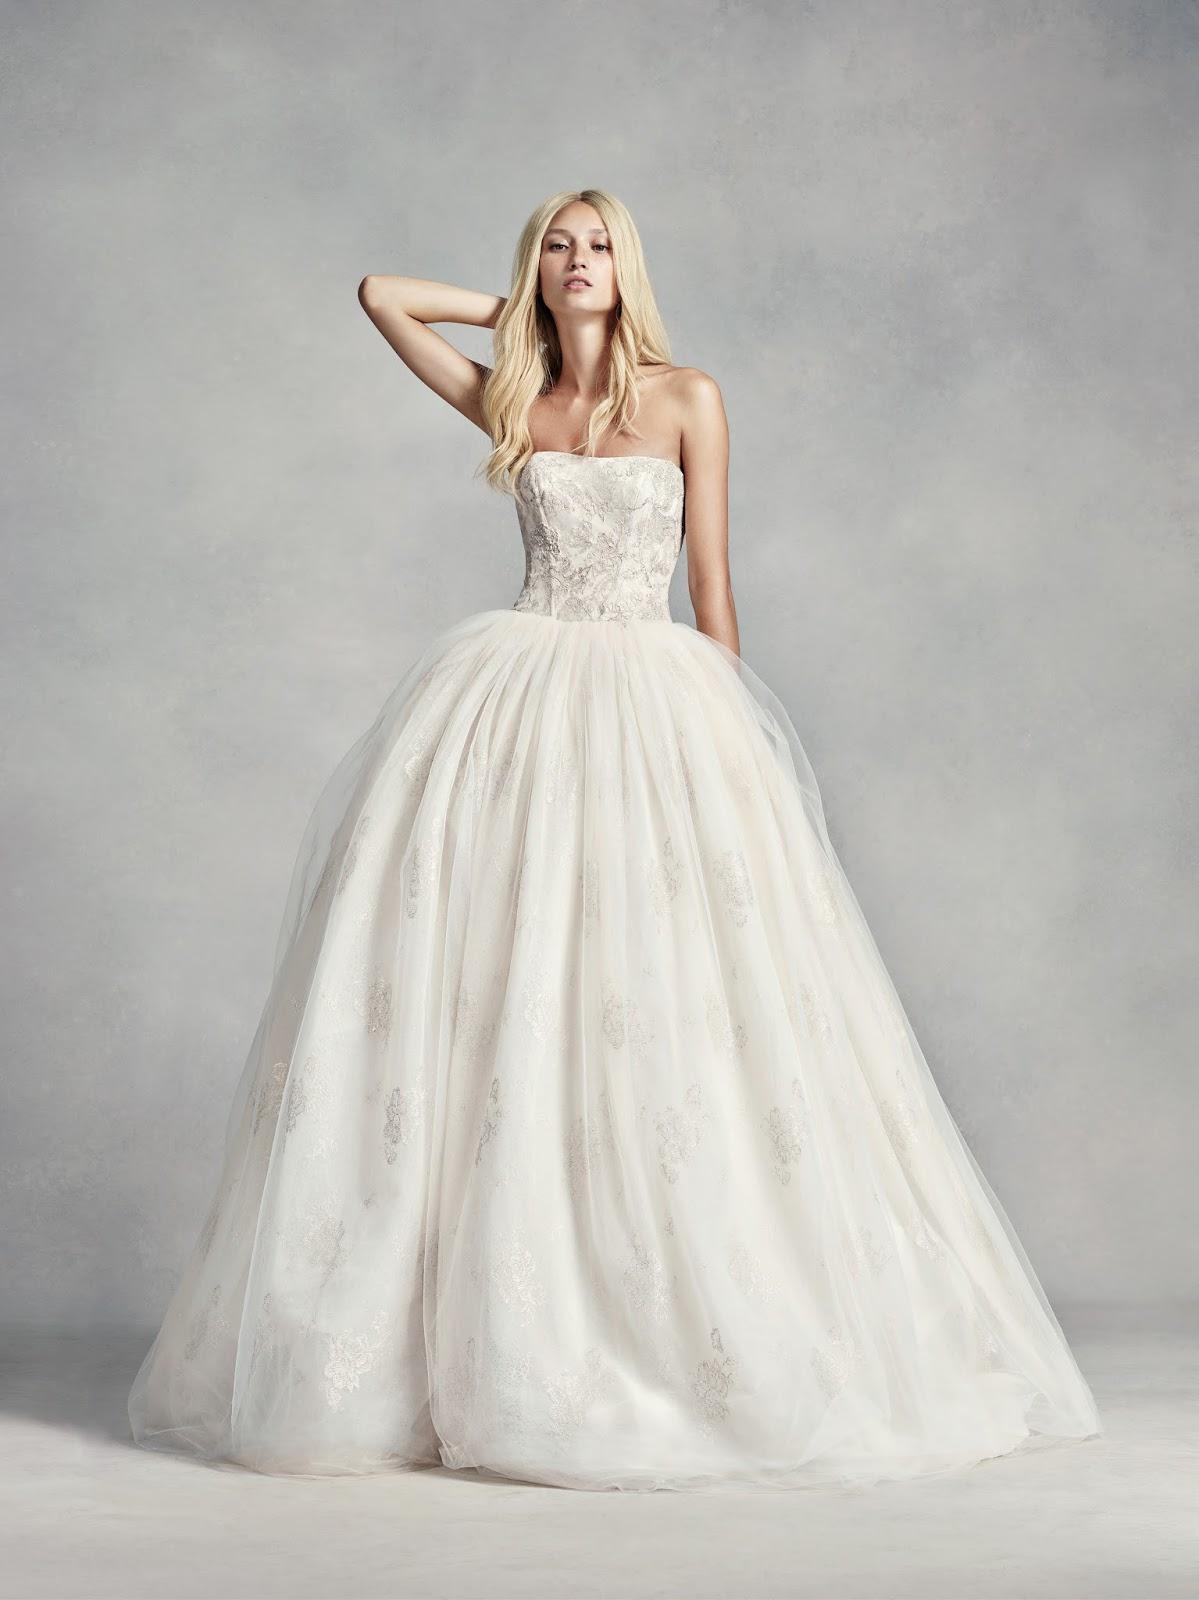 Vera Wang Bouquet Wedding Dress. Great Vera Wang In Canada Bc Blush Bridal With Vera Wang Bouquet Wedding Dress. Best White By V